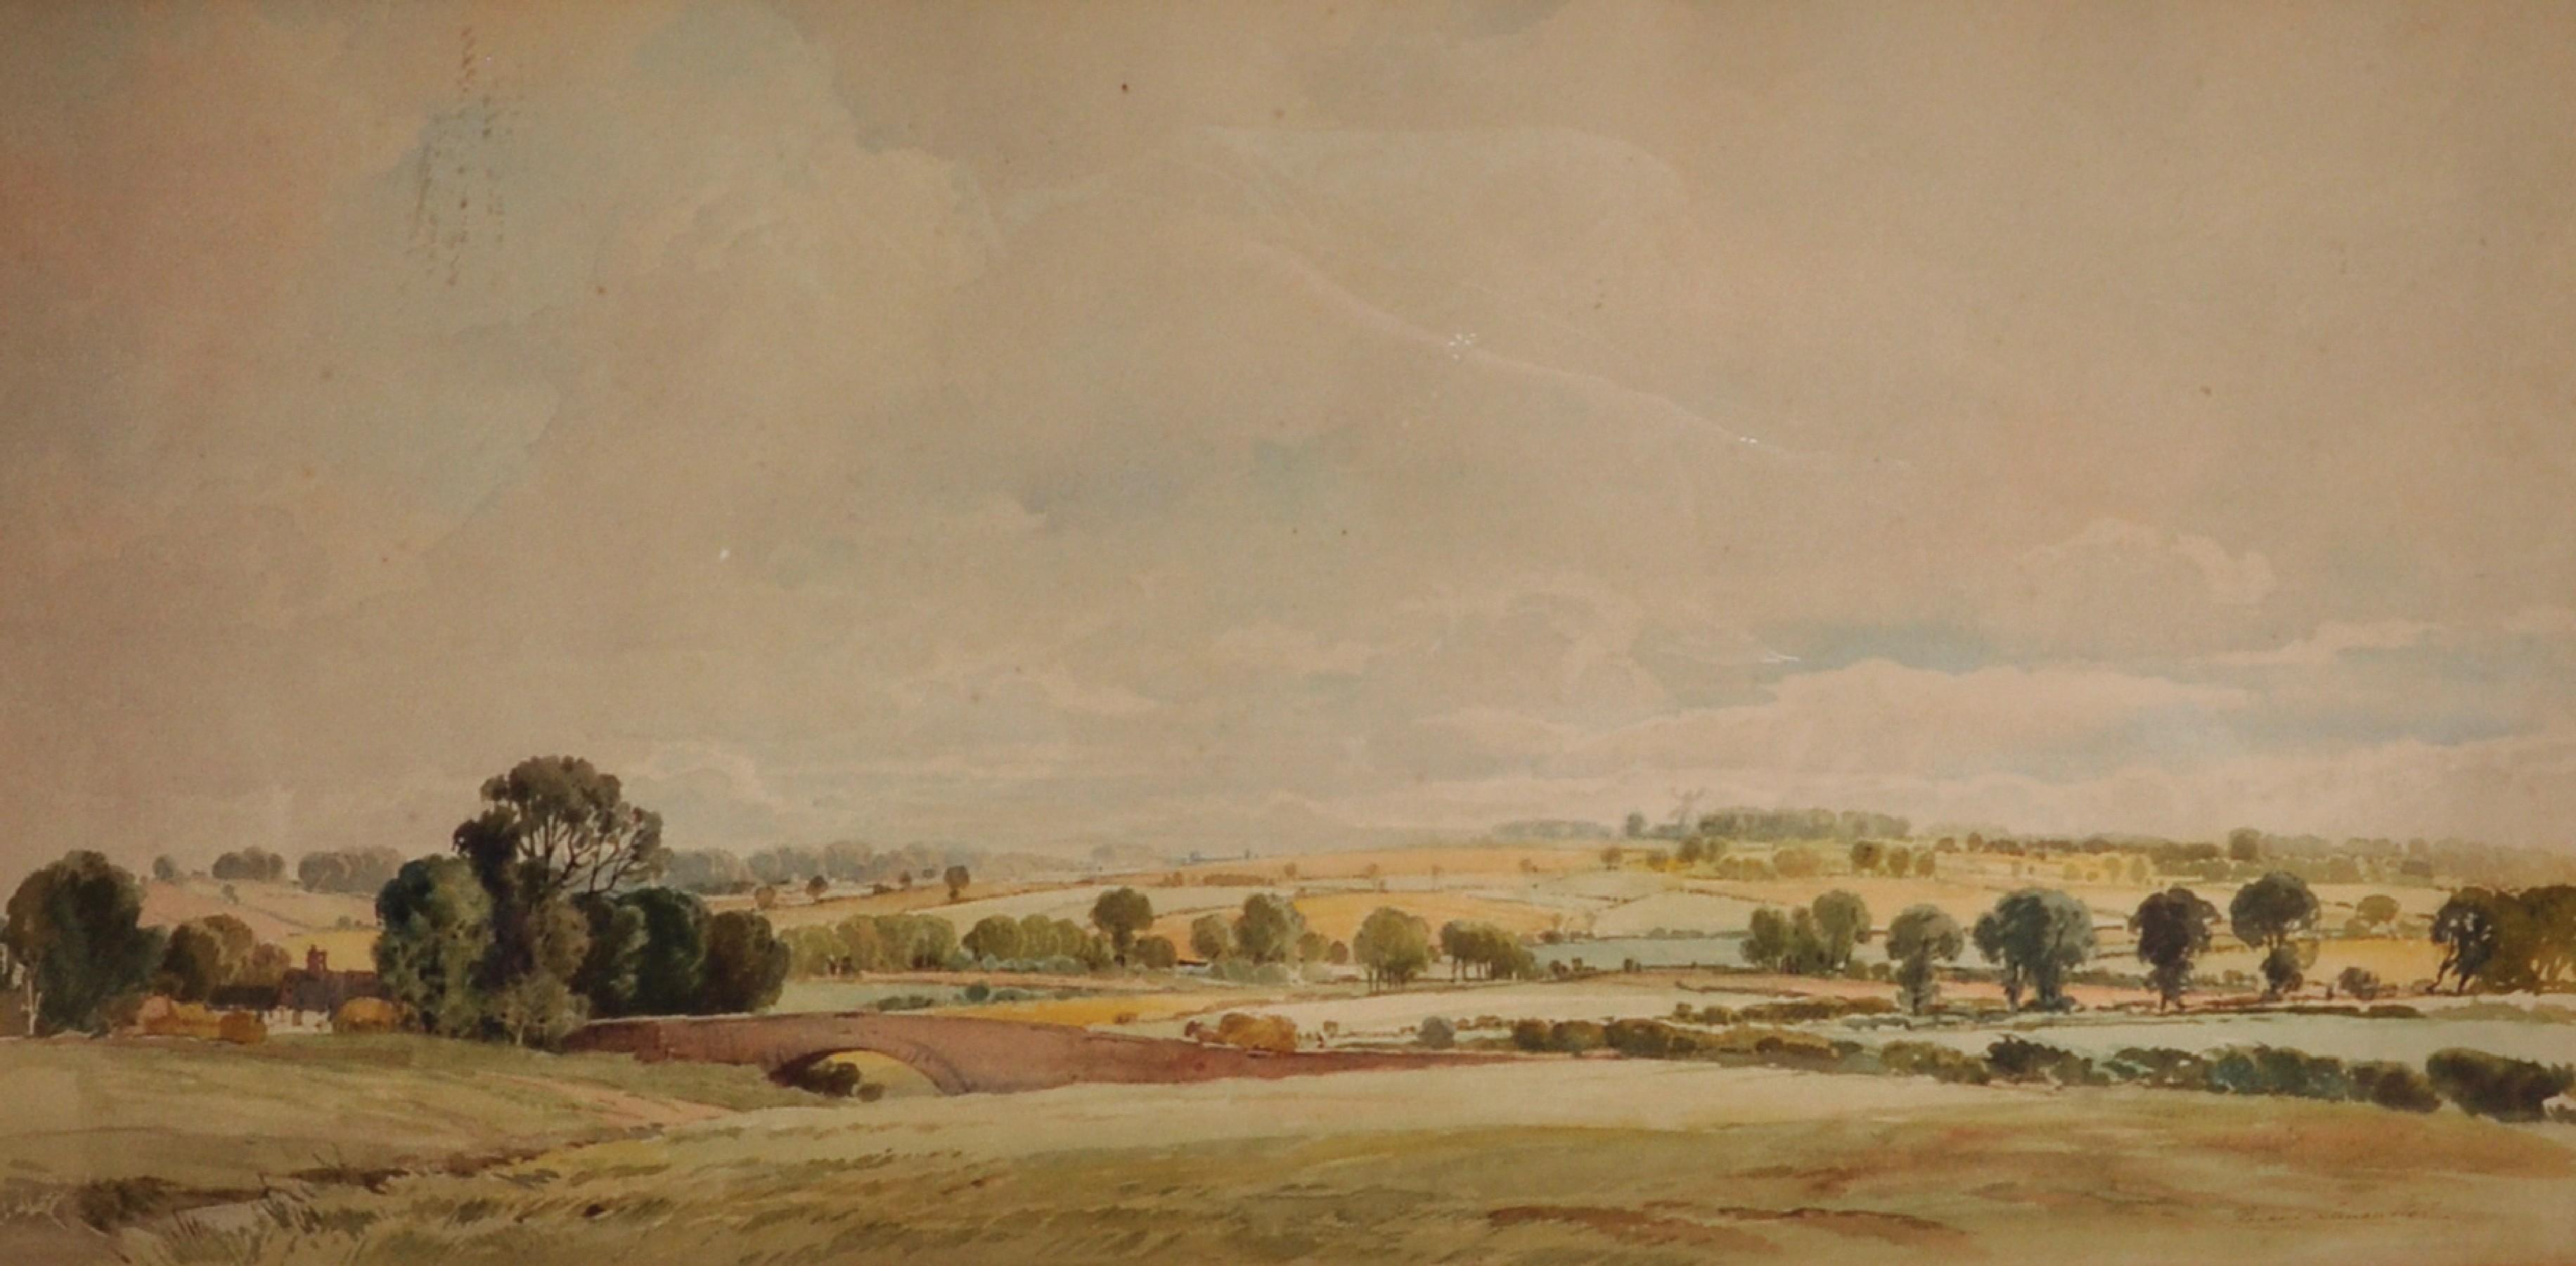 "Percy Lancaster (1878-1951) British. An Extensive Landscape, Watercolour, Signed, 12"" x 25""."